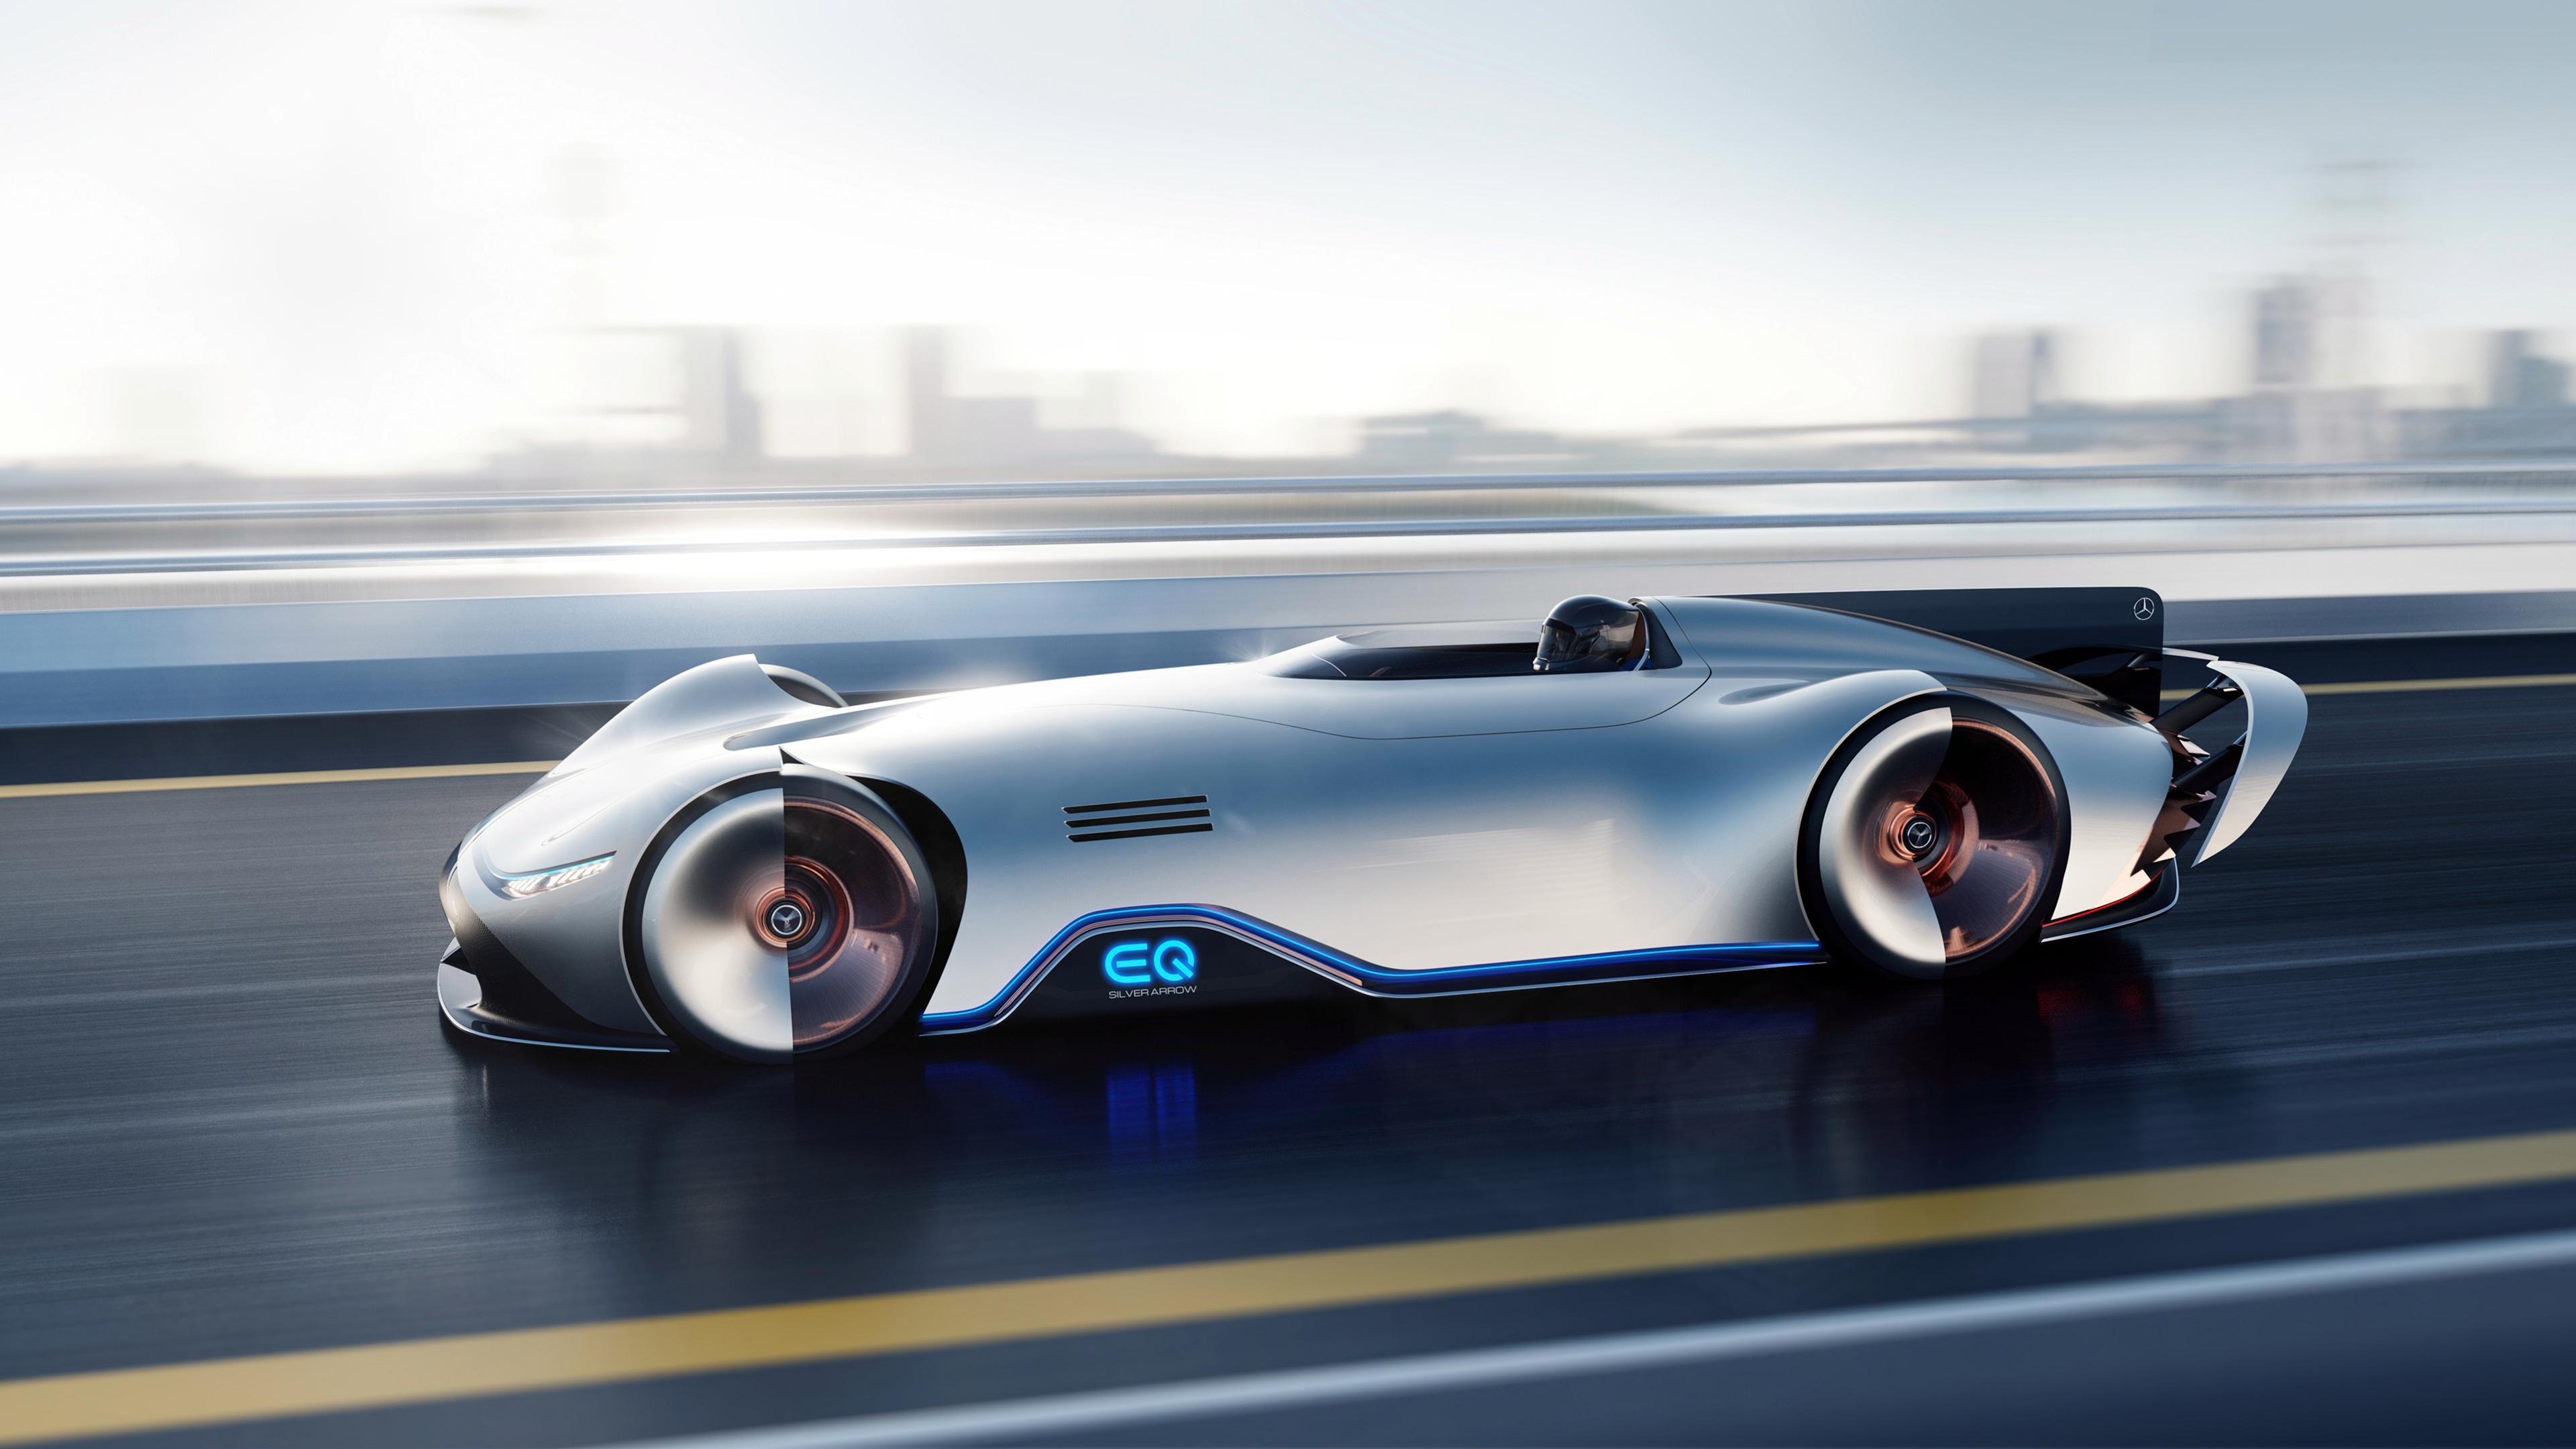 Bugatti Divo 2019 4k Wallpapers Hd Wallpapers